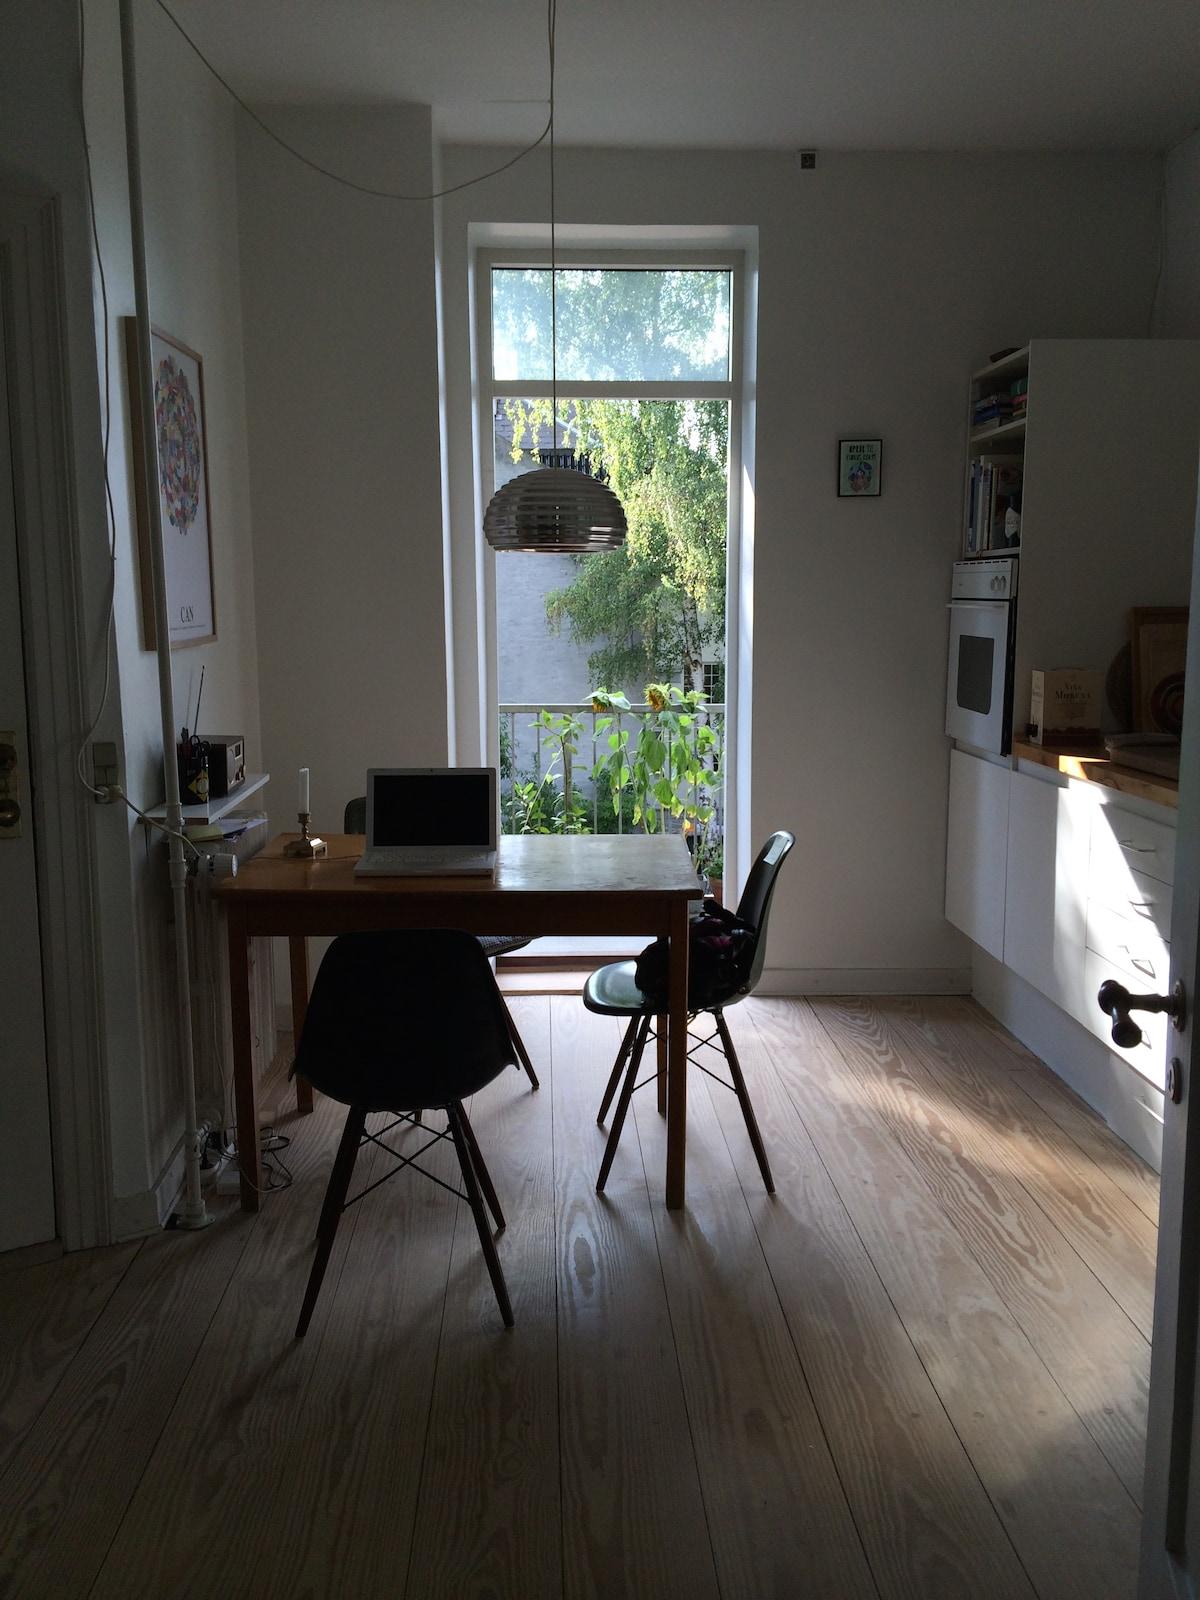 Typical Copenhagen-style flat